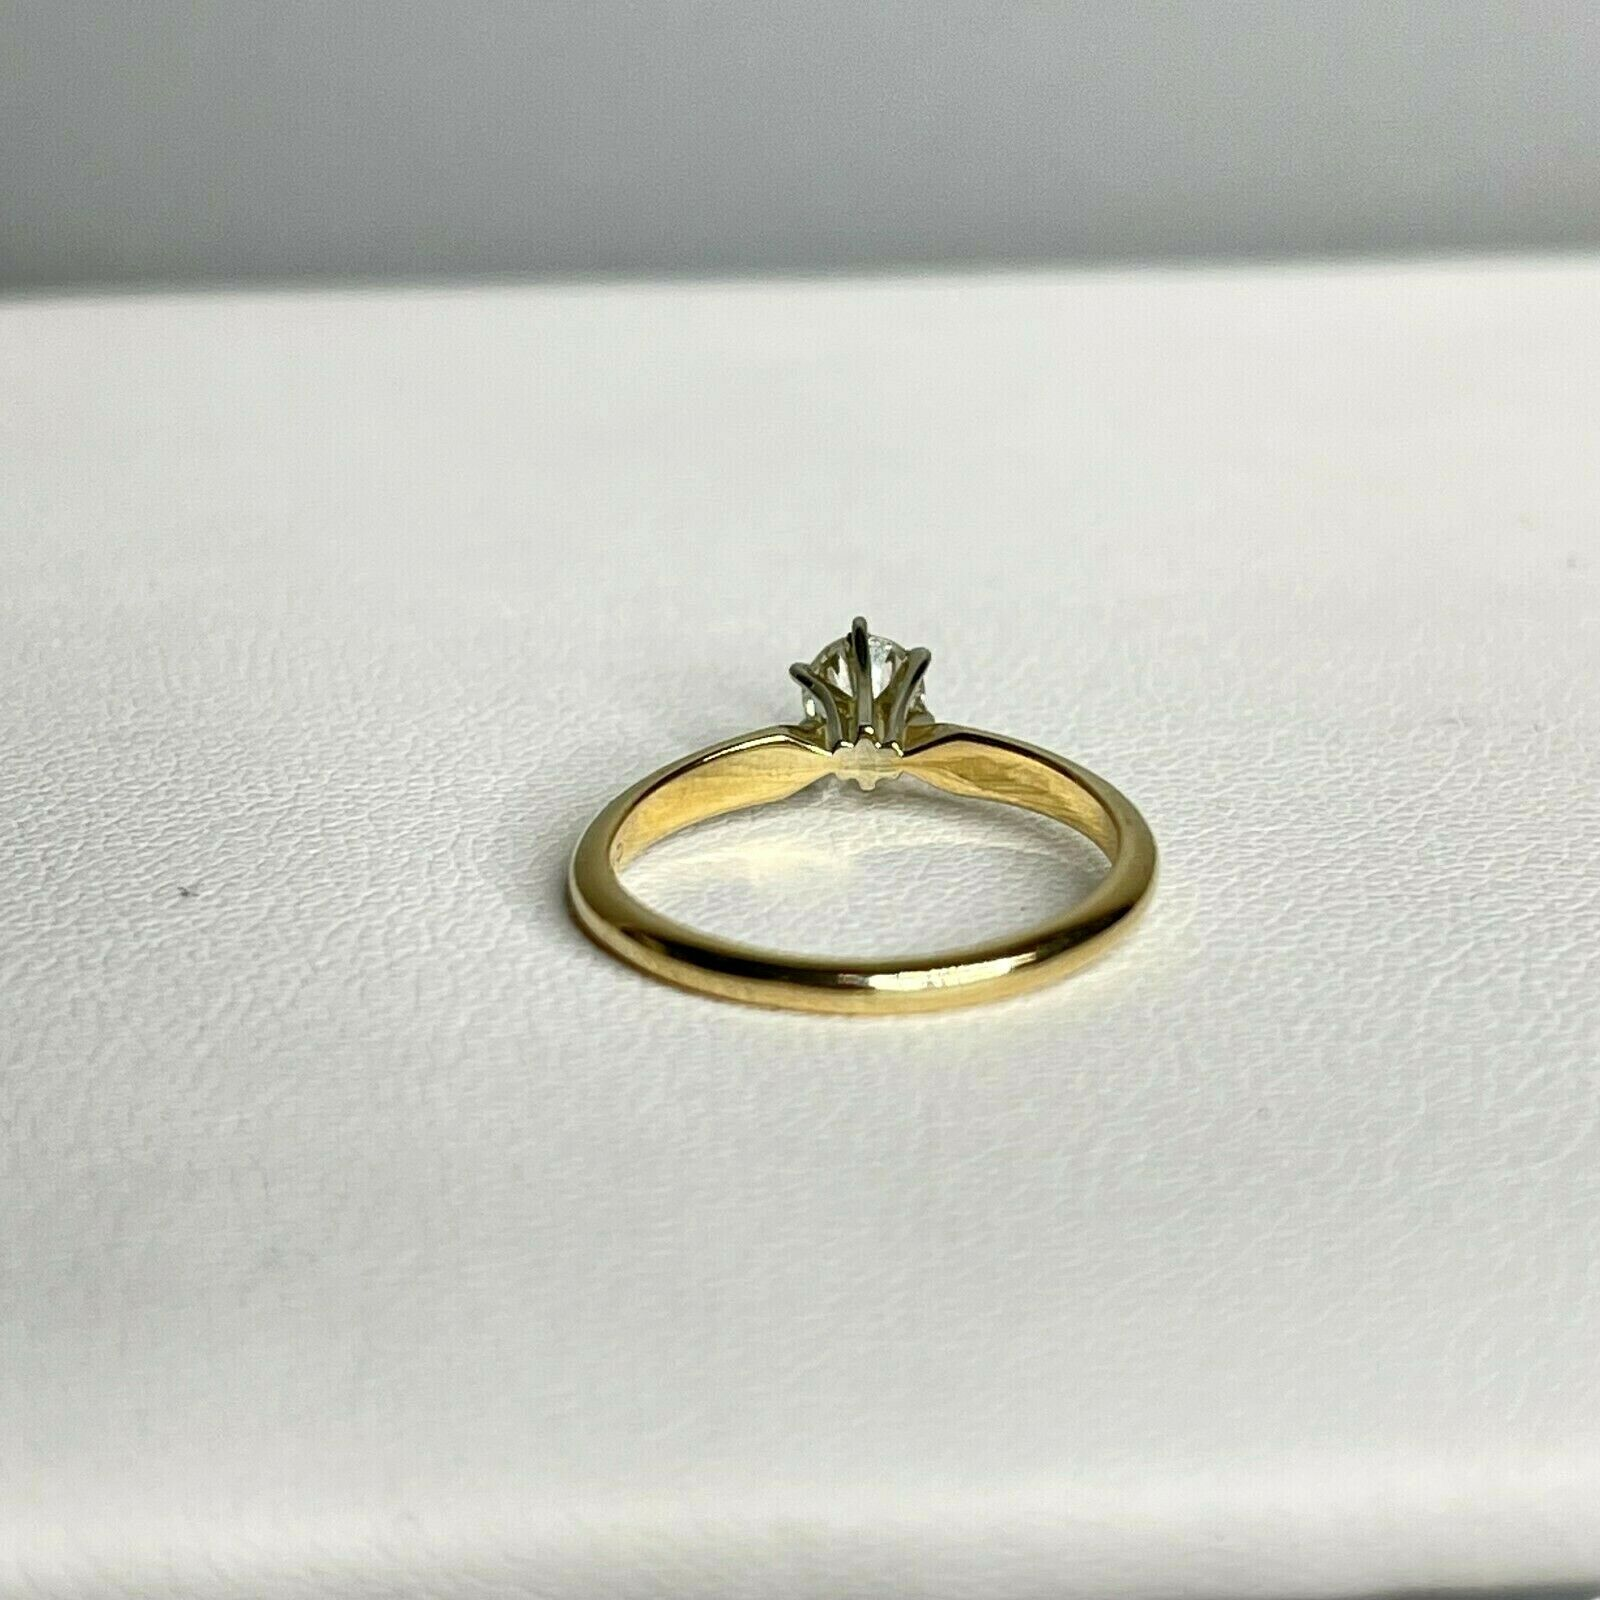 Vintage Signed DACO 14k Yellow Gold Diamond Solit… - image 6